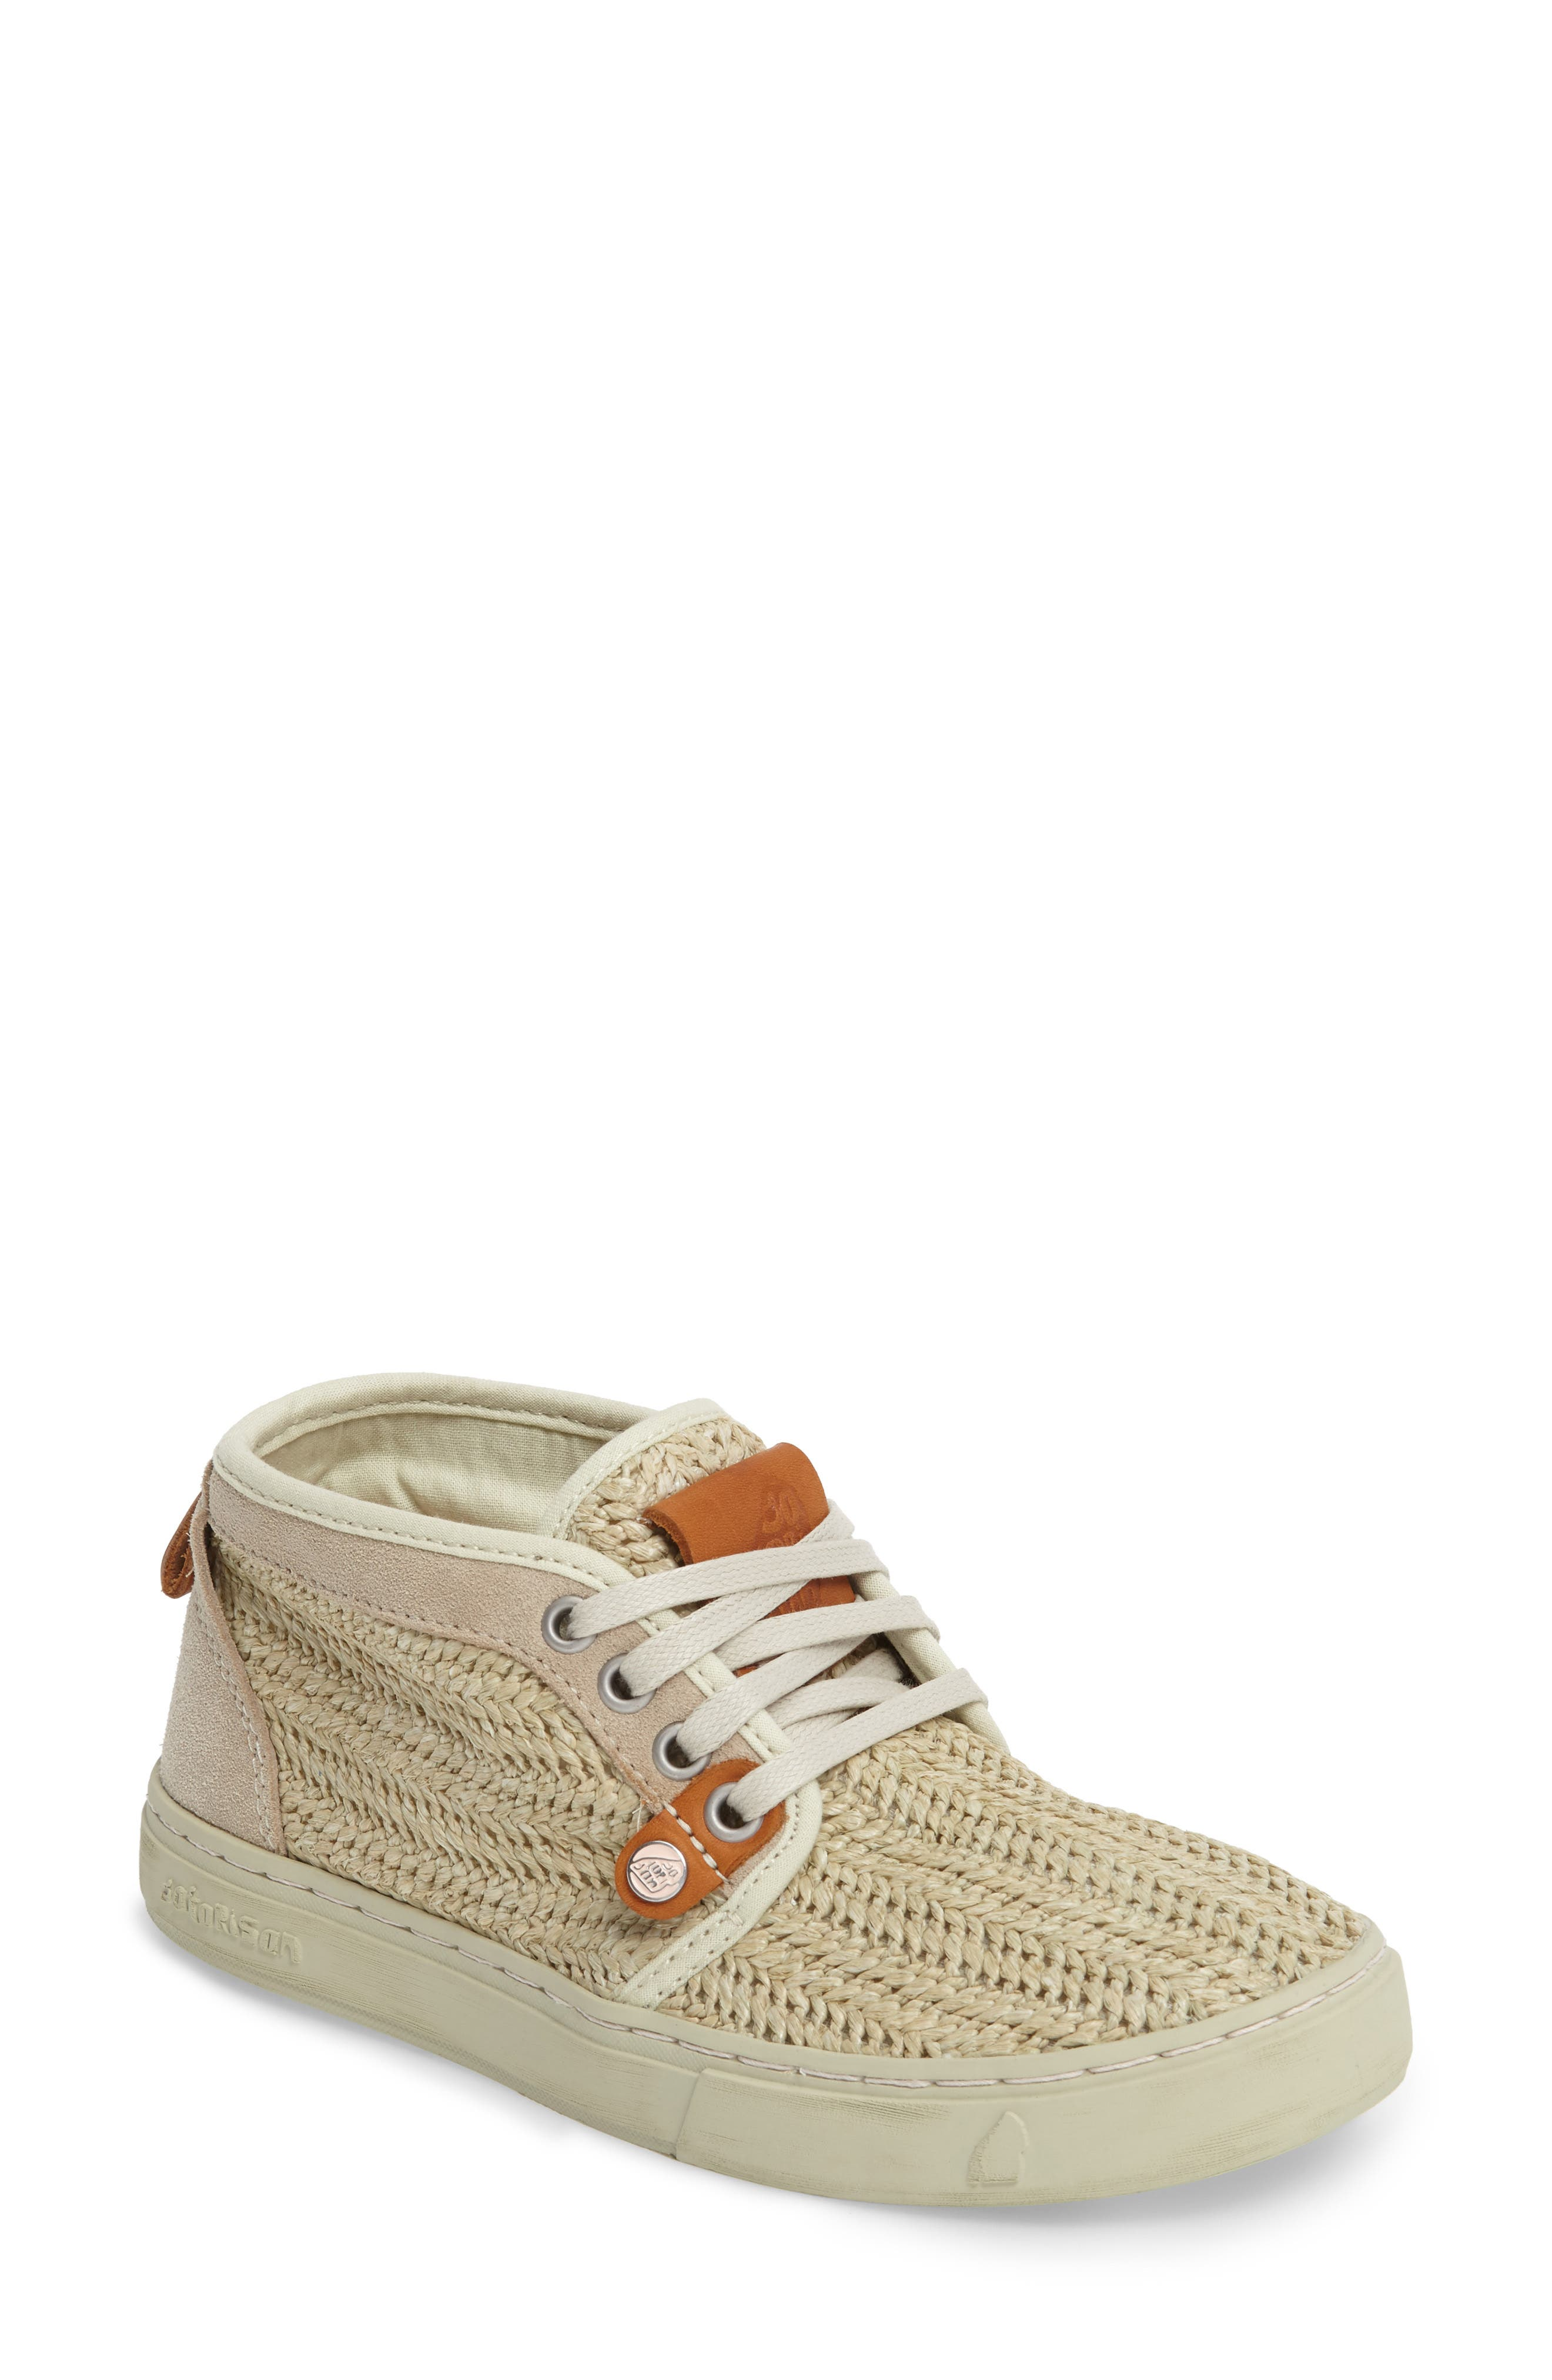 Hamoru Woven High Top Sneaker,                         Main,                         color, YESO FABRIC